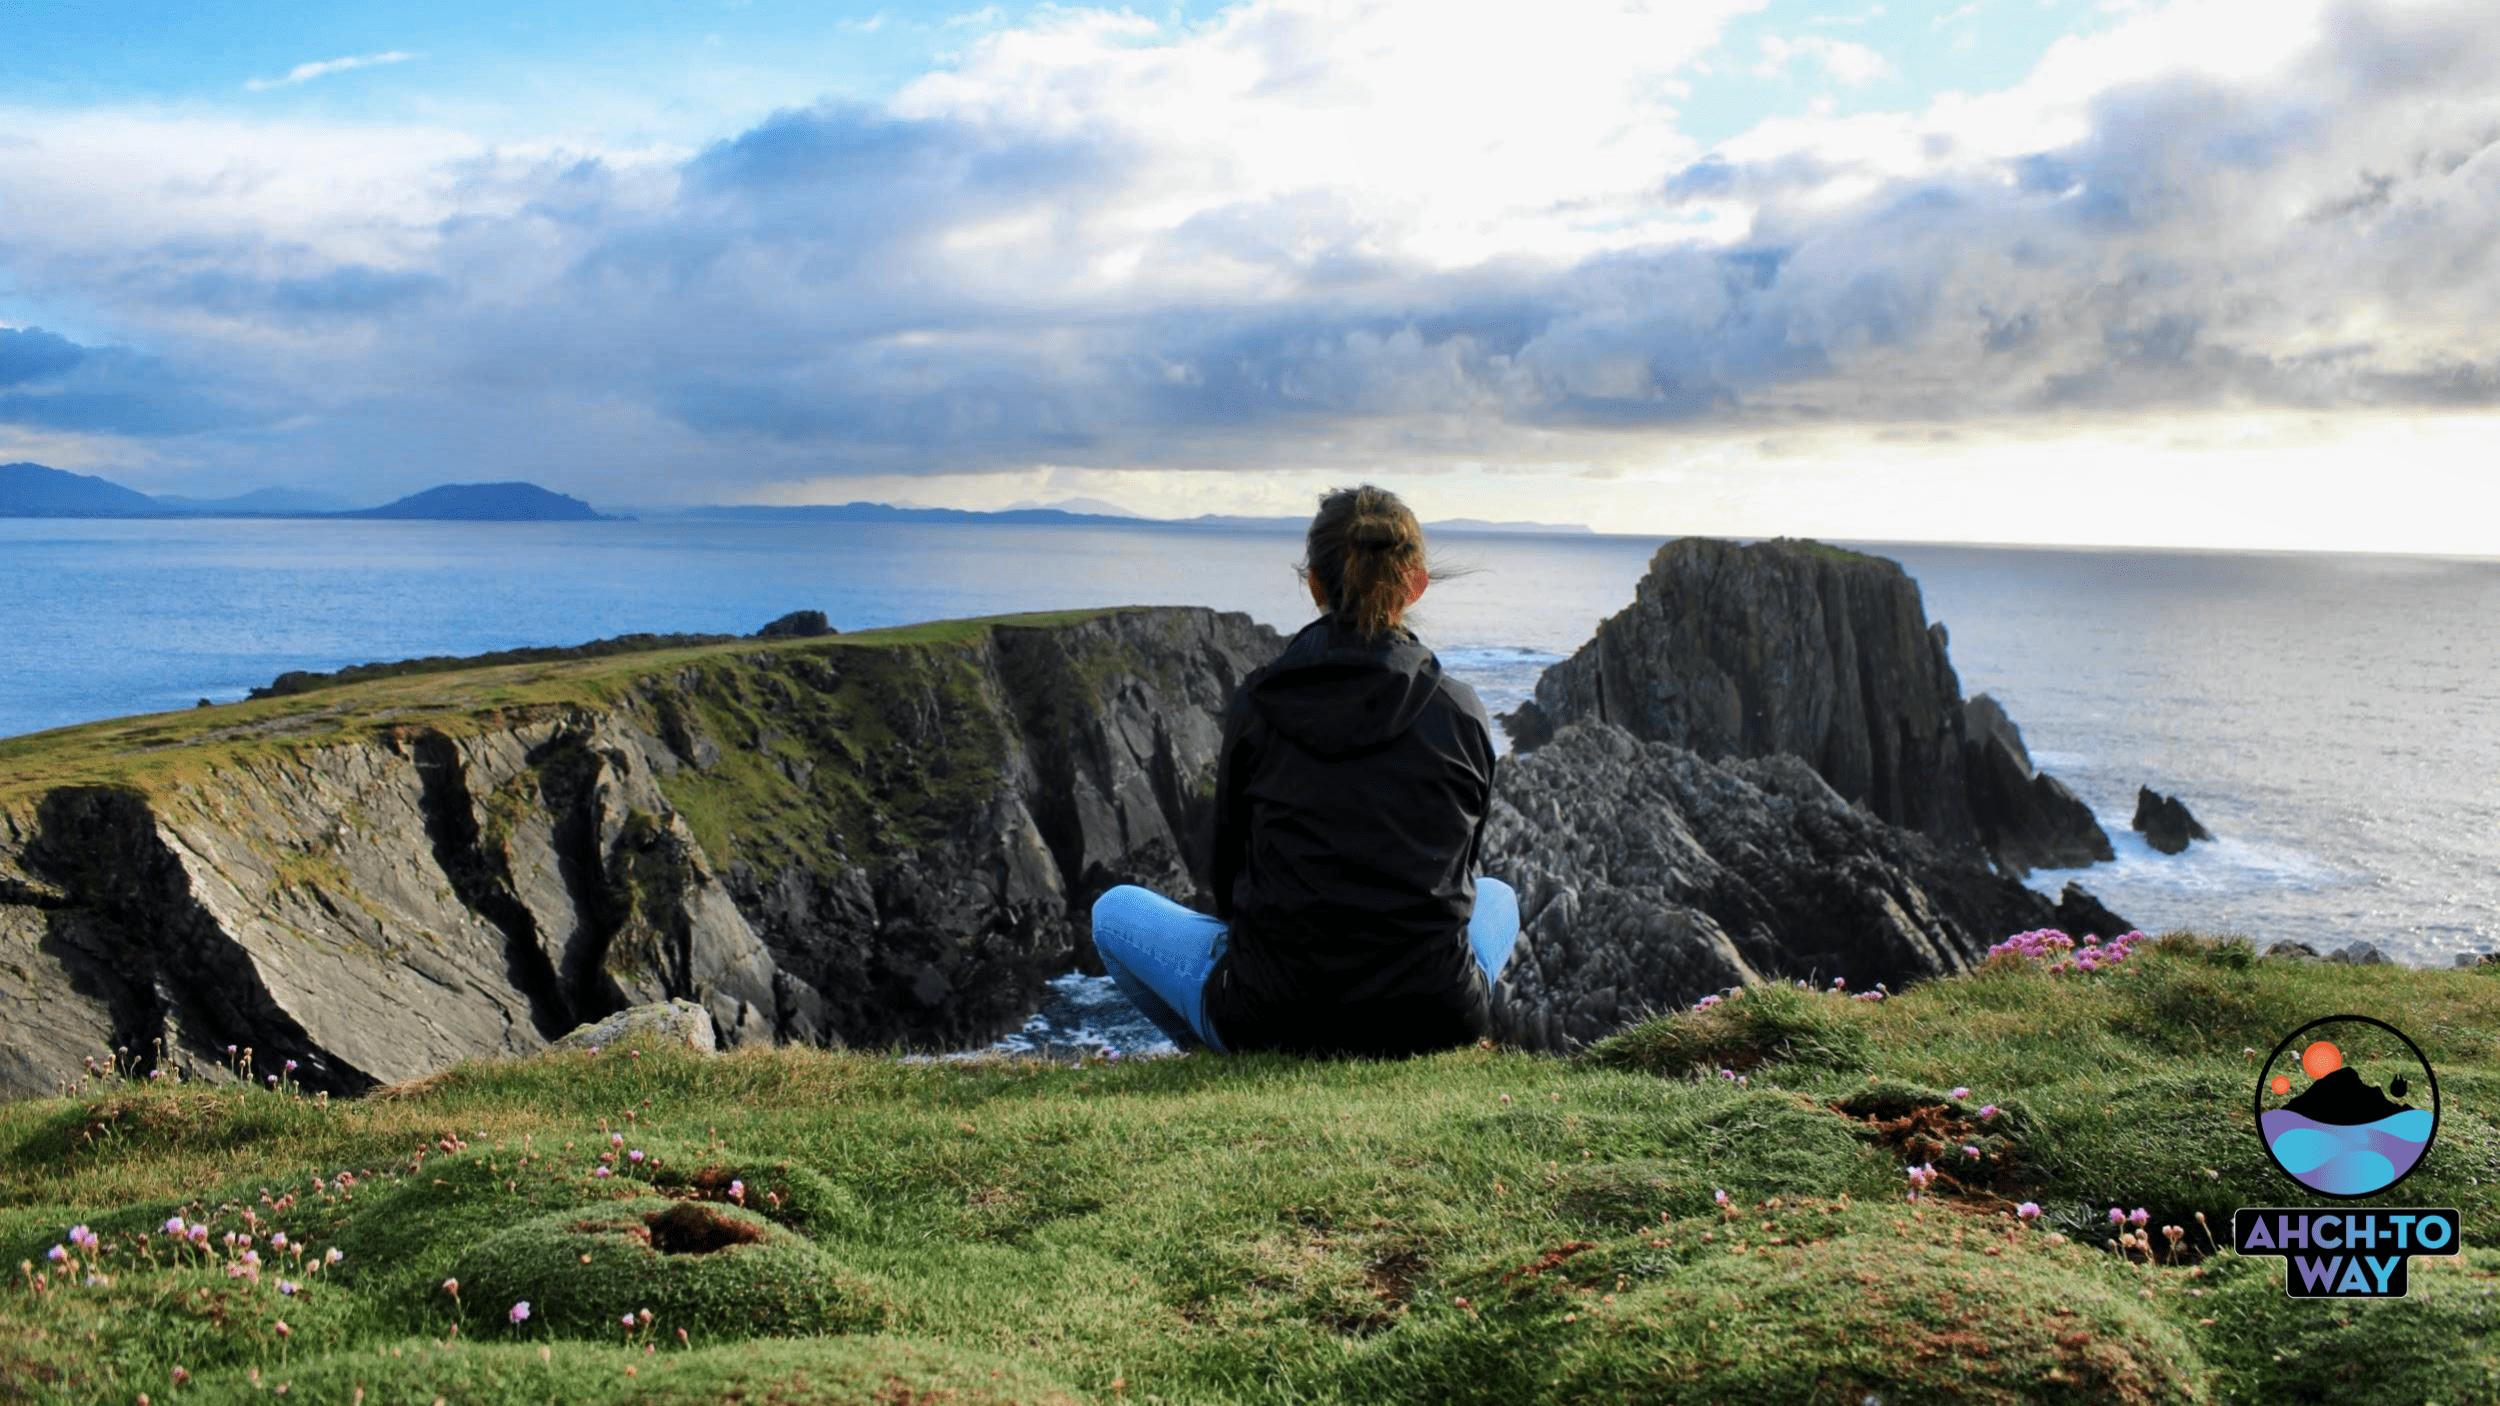 Fáilte Go Ahch-To Way ~ Malin Head, Donegal, Ireland